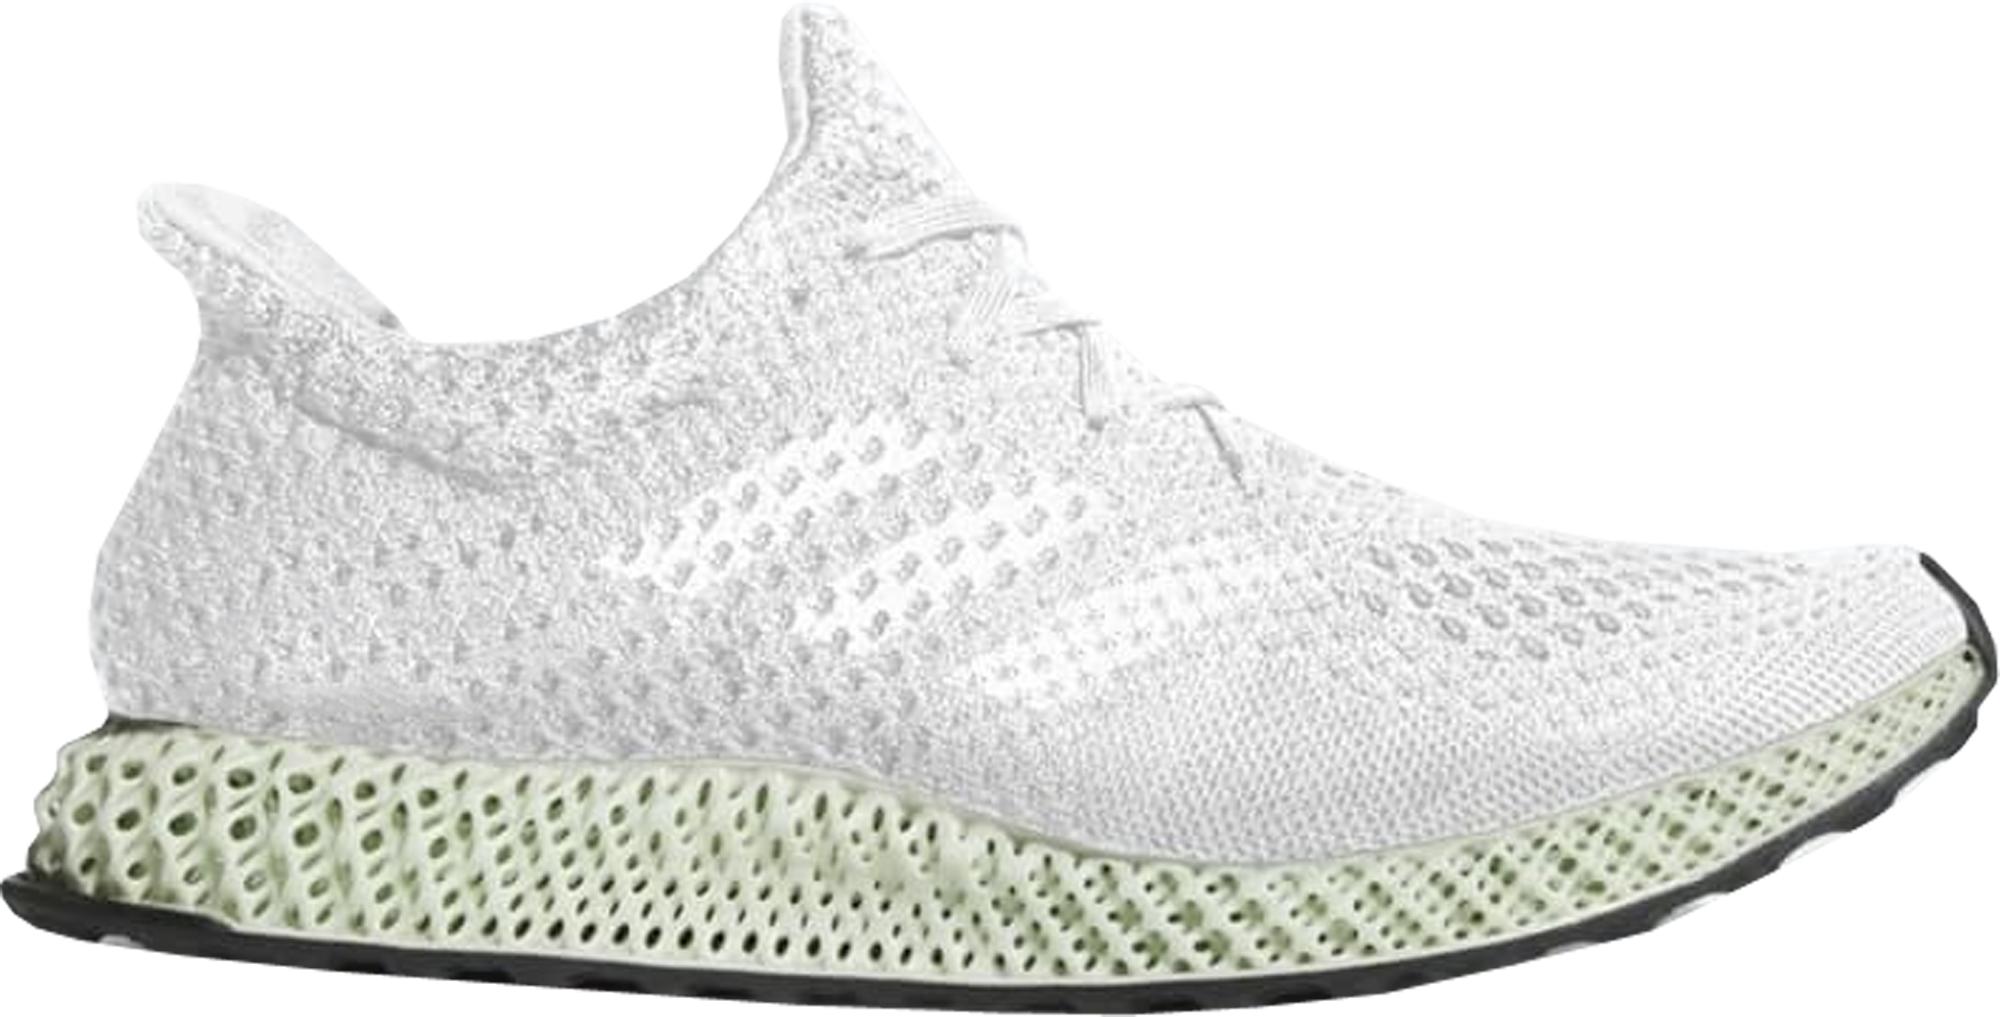 adidas Futurecraft 4D White Ash Green